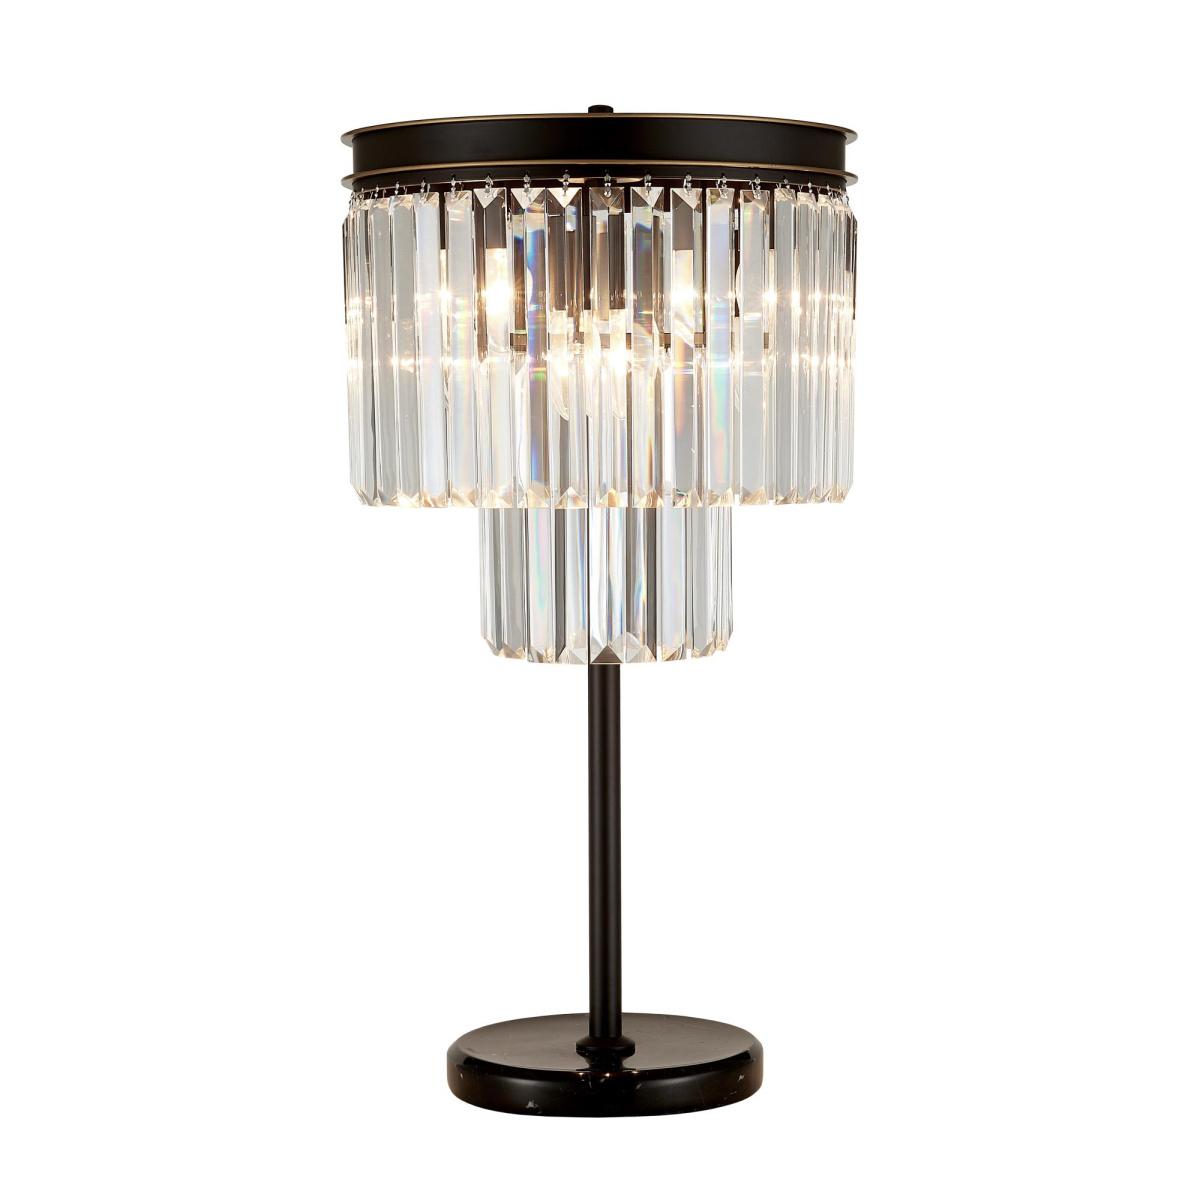 Настольная лампа Citilux Мартин CL332861, 6xE14x60W, венге, прозрачный, металл, хрусталь - фото 1